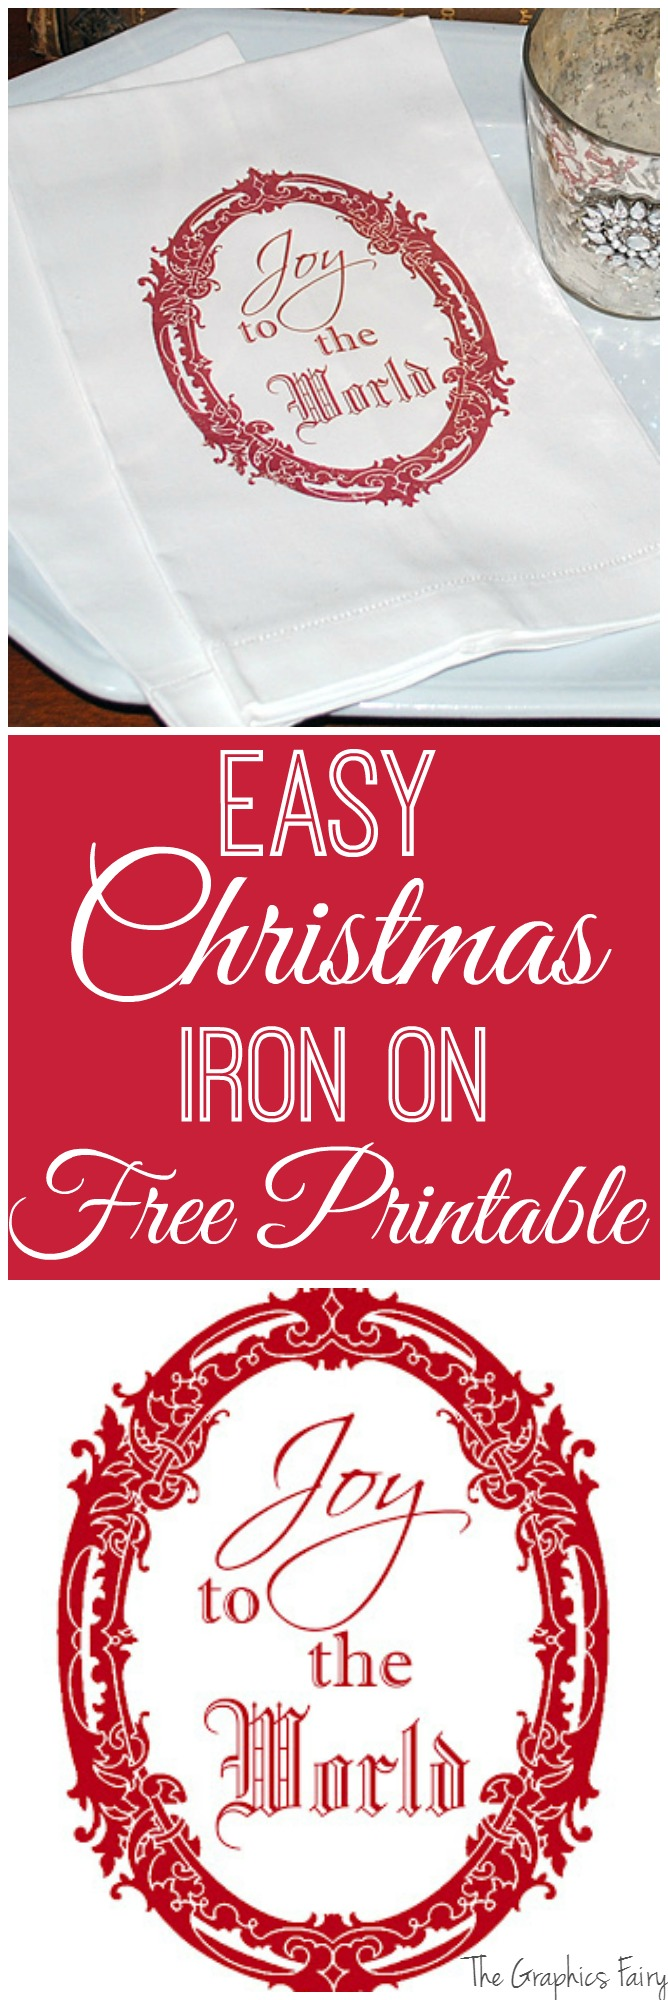 Easy Christmas Iron On FREE Printable - The Graphics Fairy